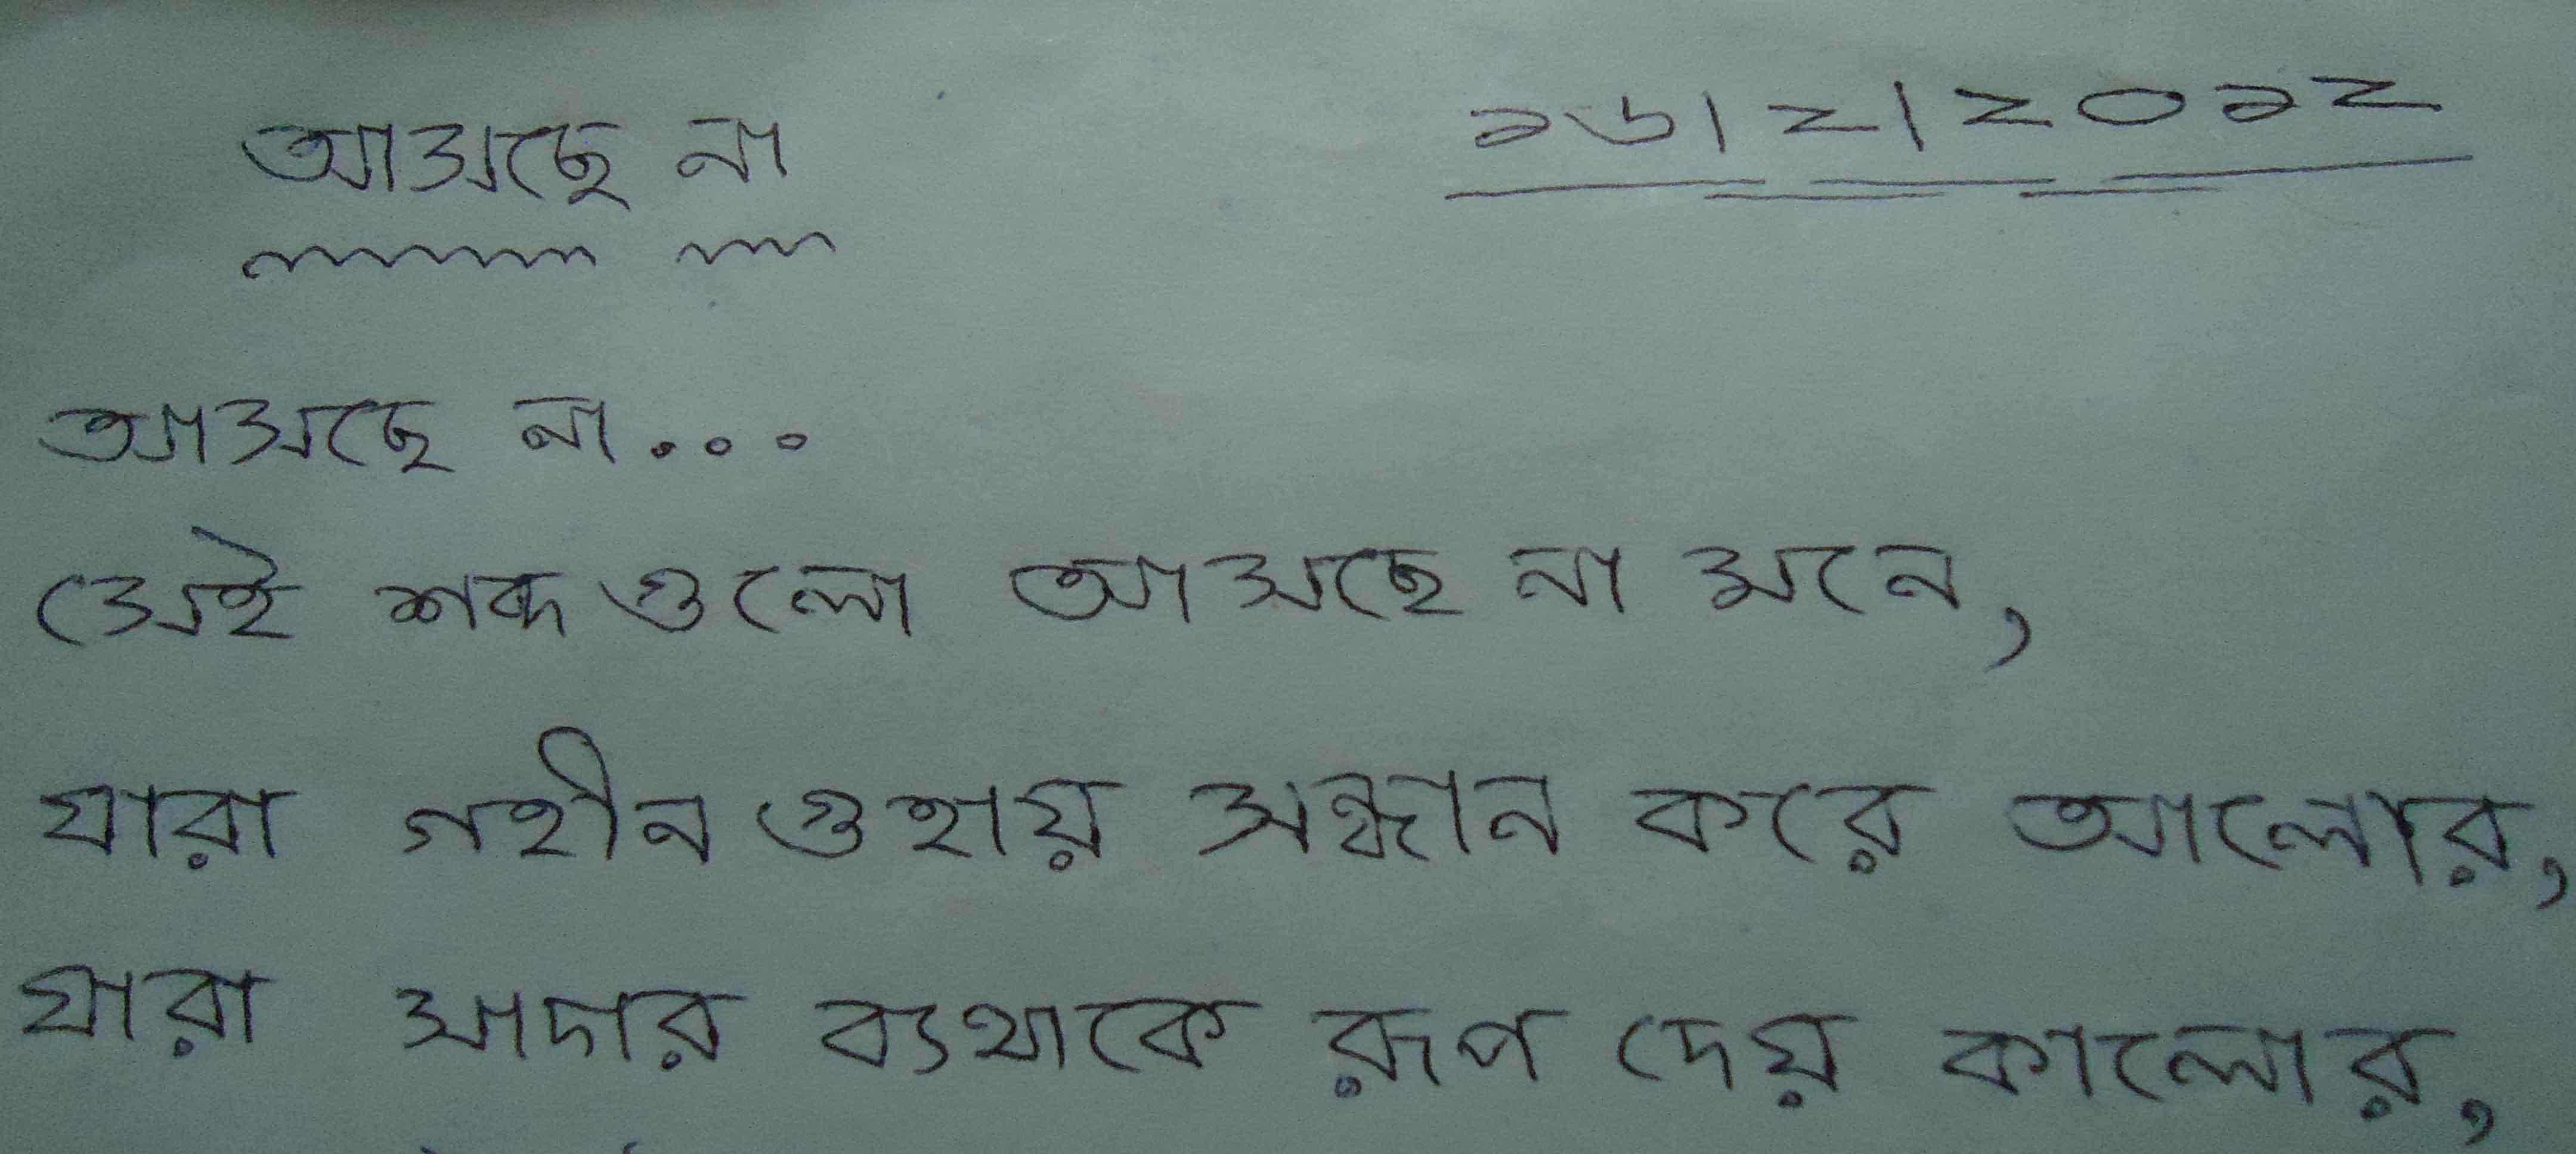 poet Biswajit | A Blog on Food, Local Restaurants